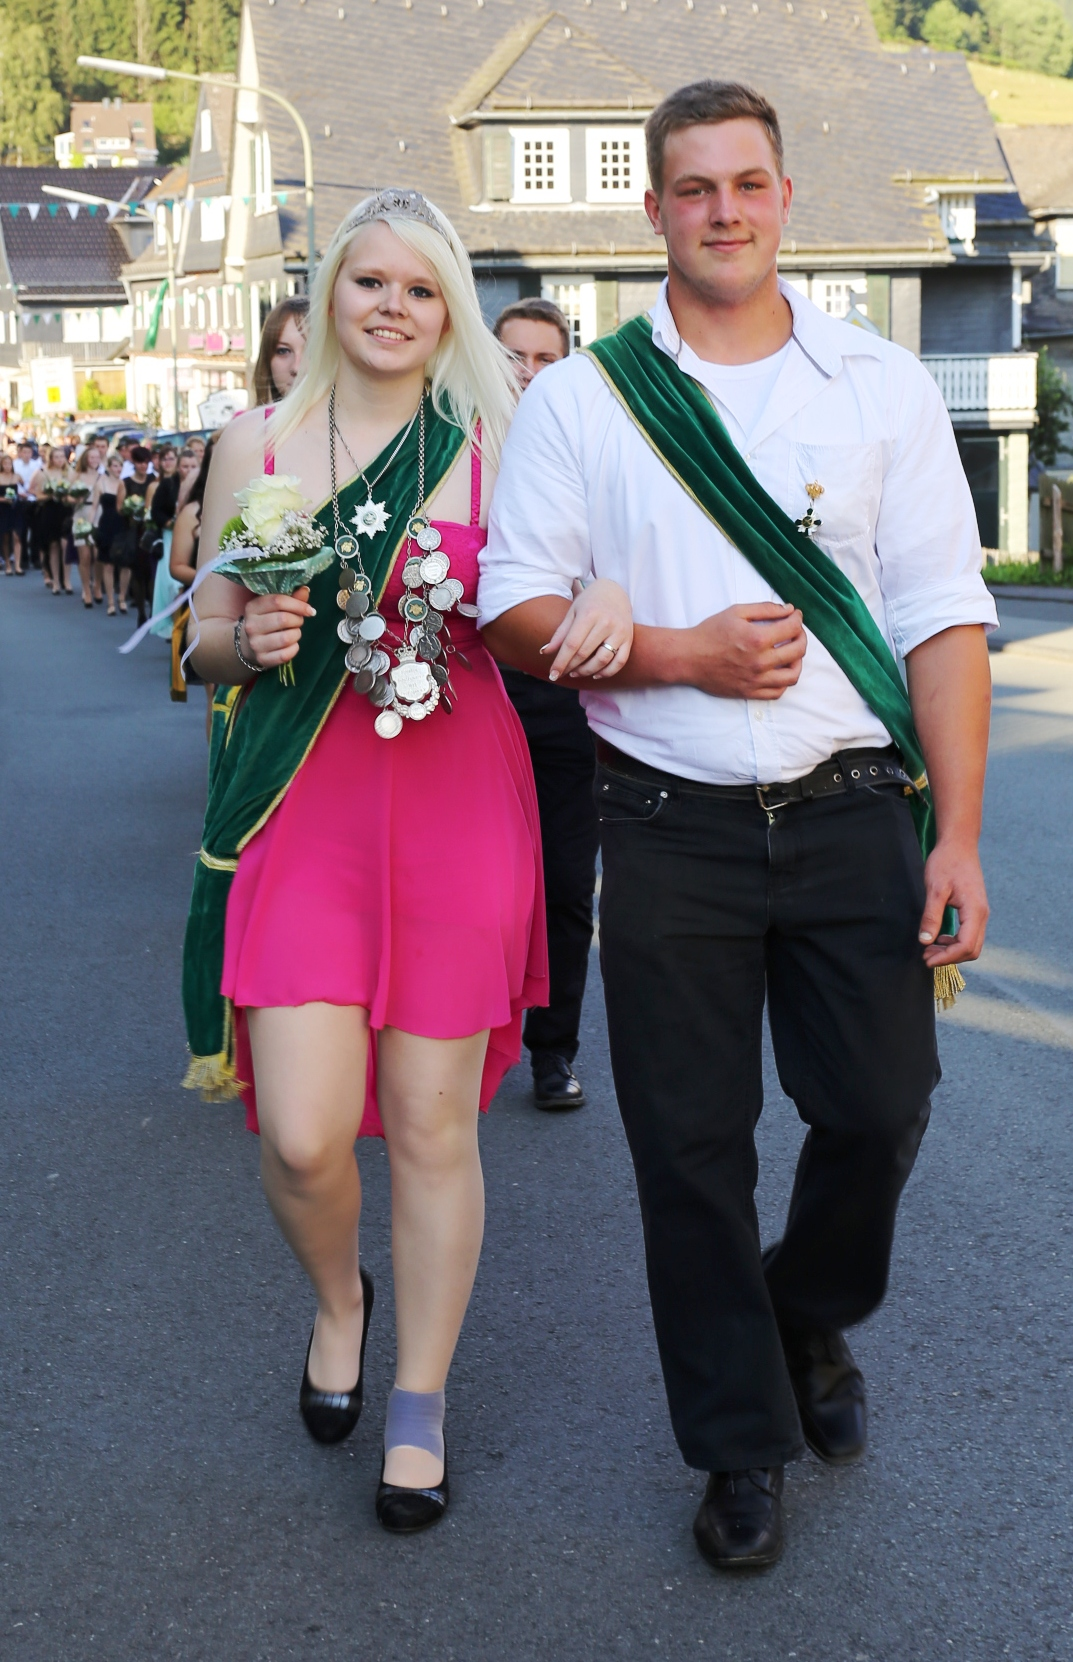 Jungschützenkönigspaar 2015: Jaqueline Heßler und Prinzregent Tom Müller